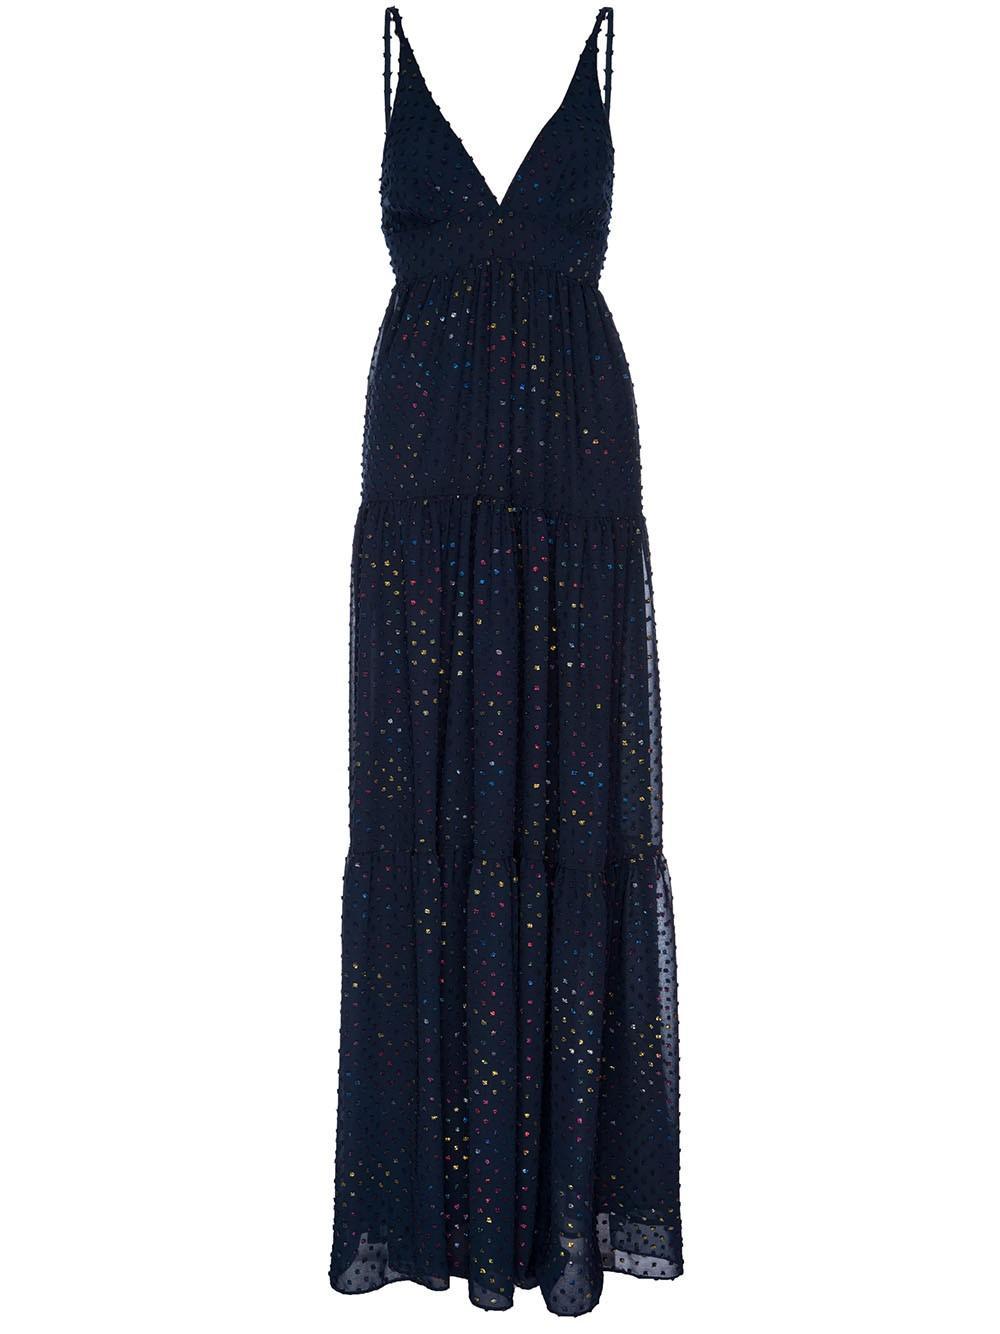 Starry Night Rainbow Maxi Dress Item # SP20-627RBW